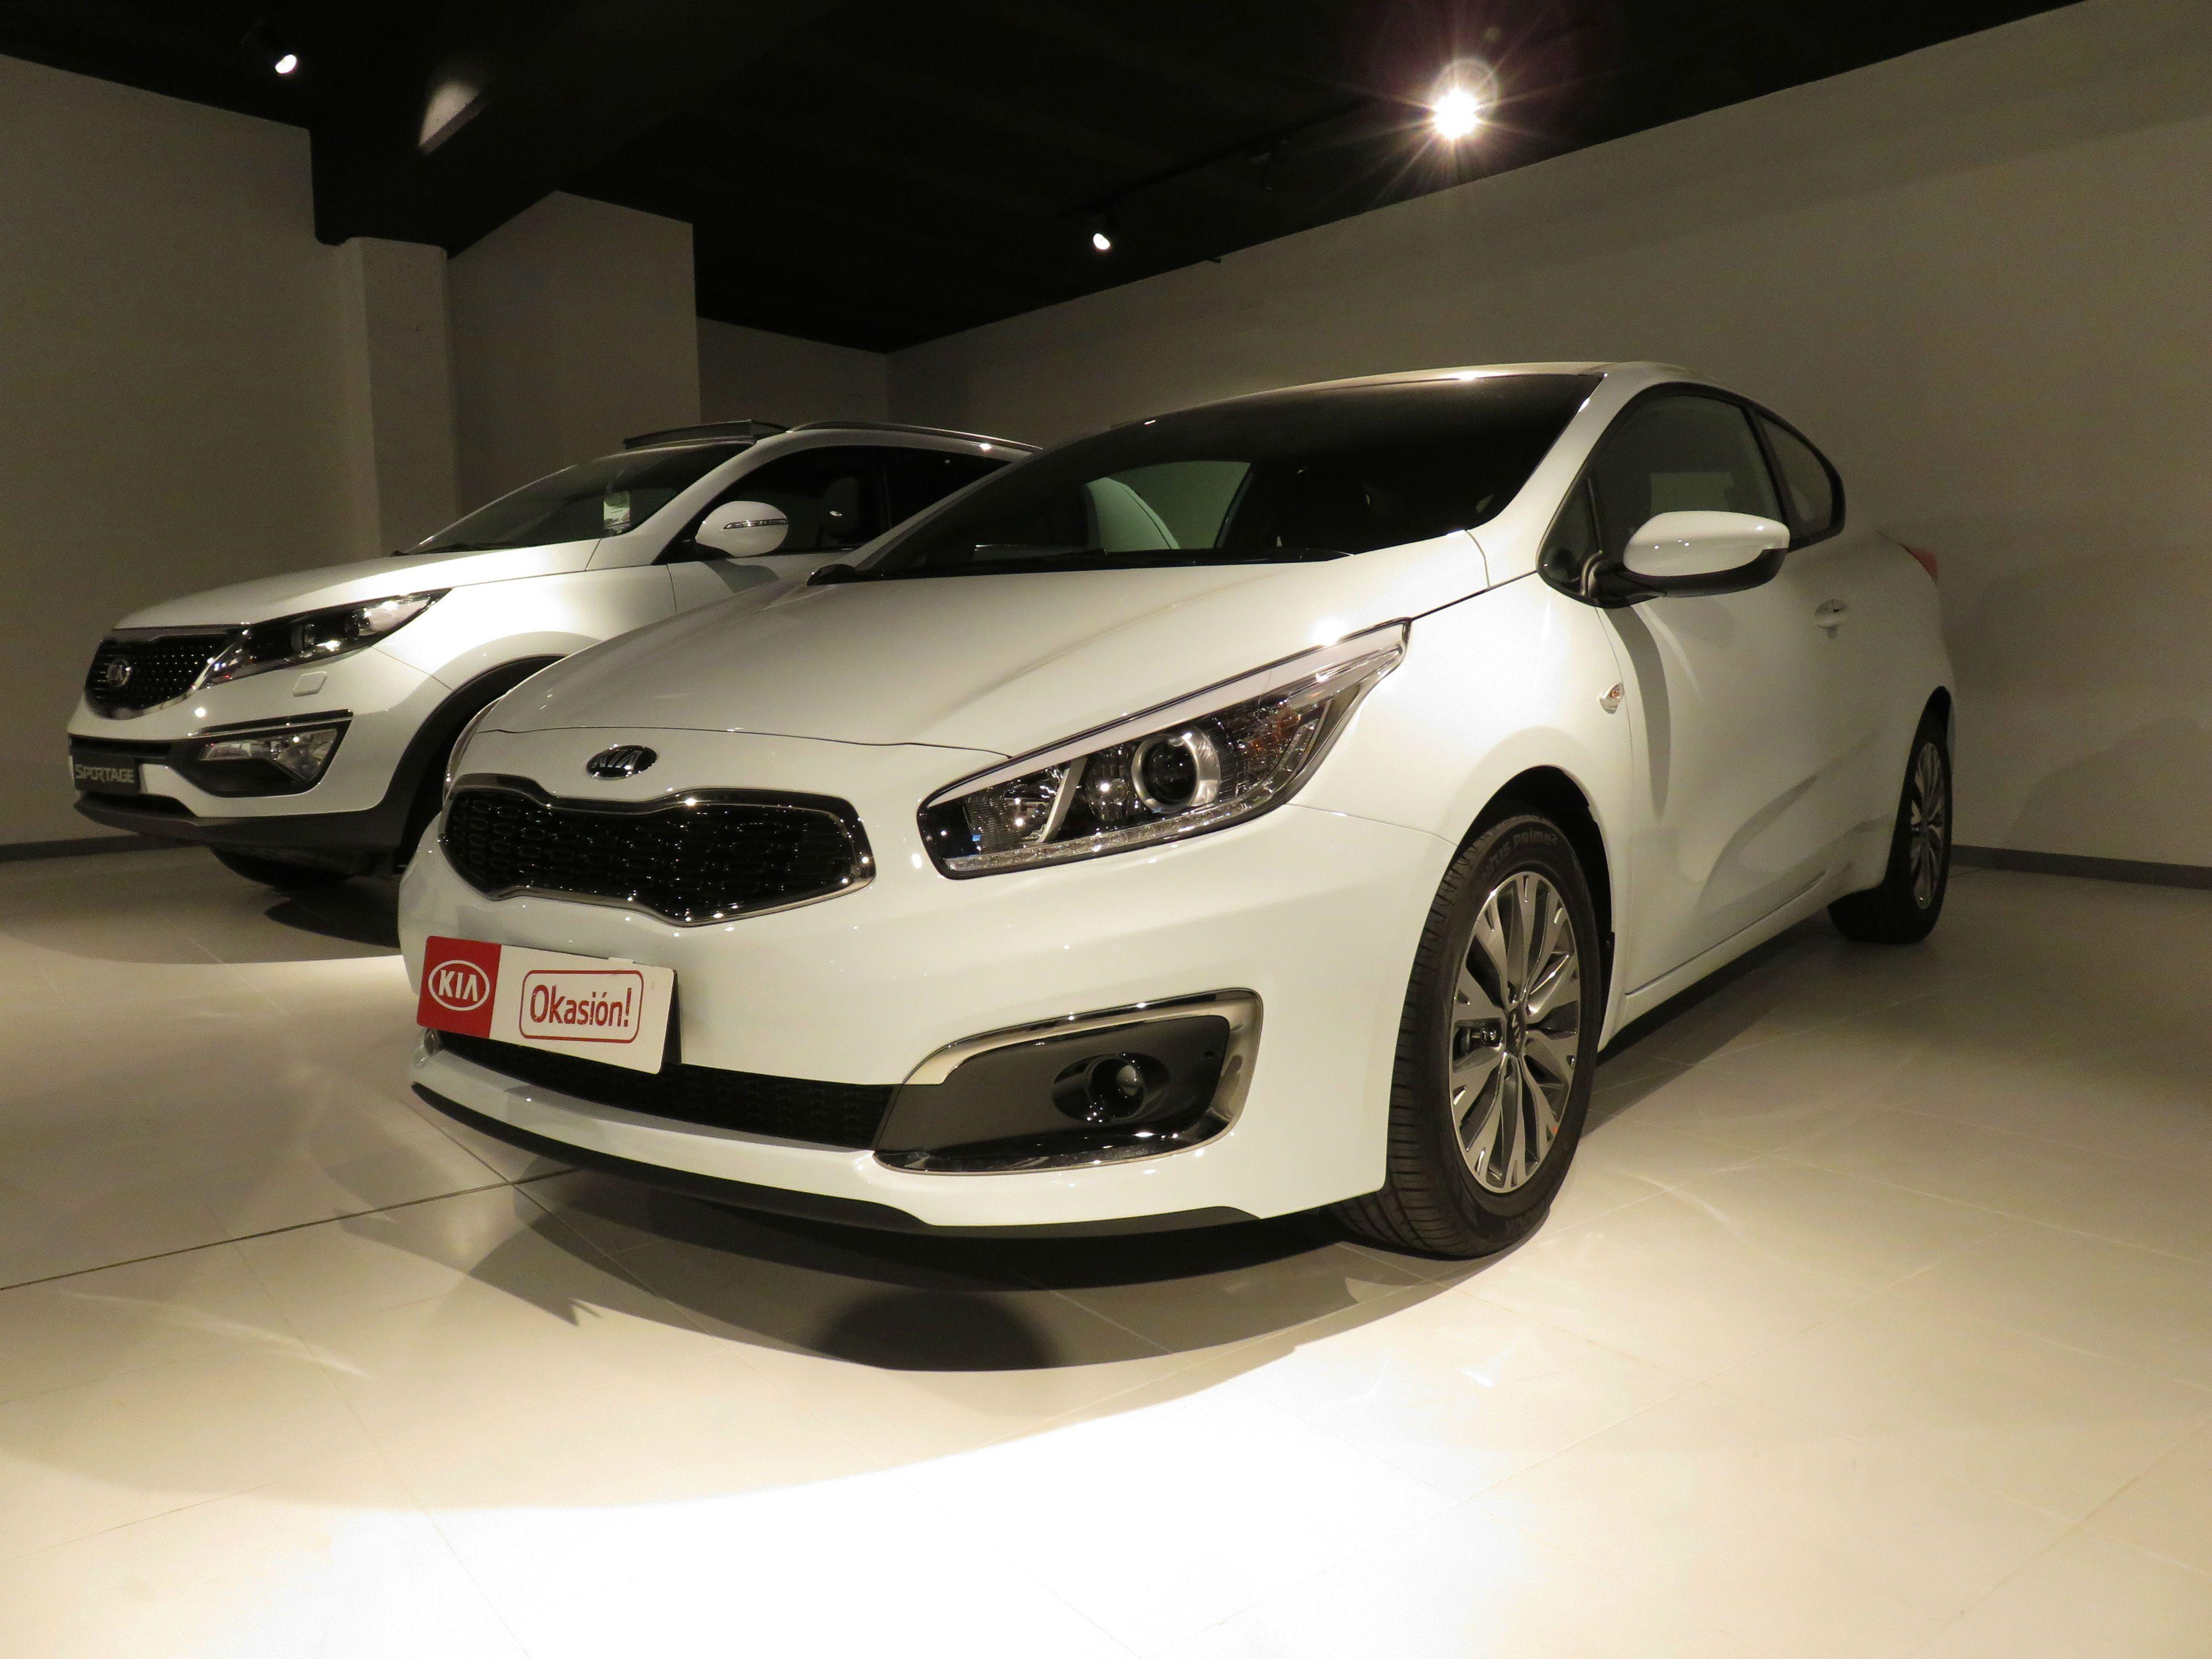 Kia Pro-Cee'd 1.0 T-GDI 120CV Drive por 13.600€*